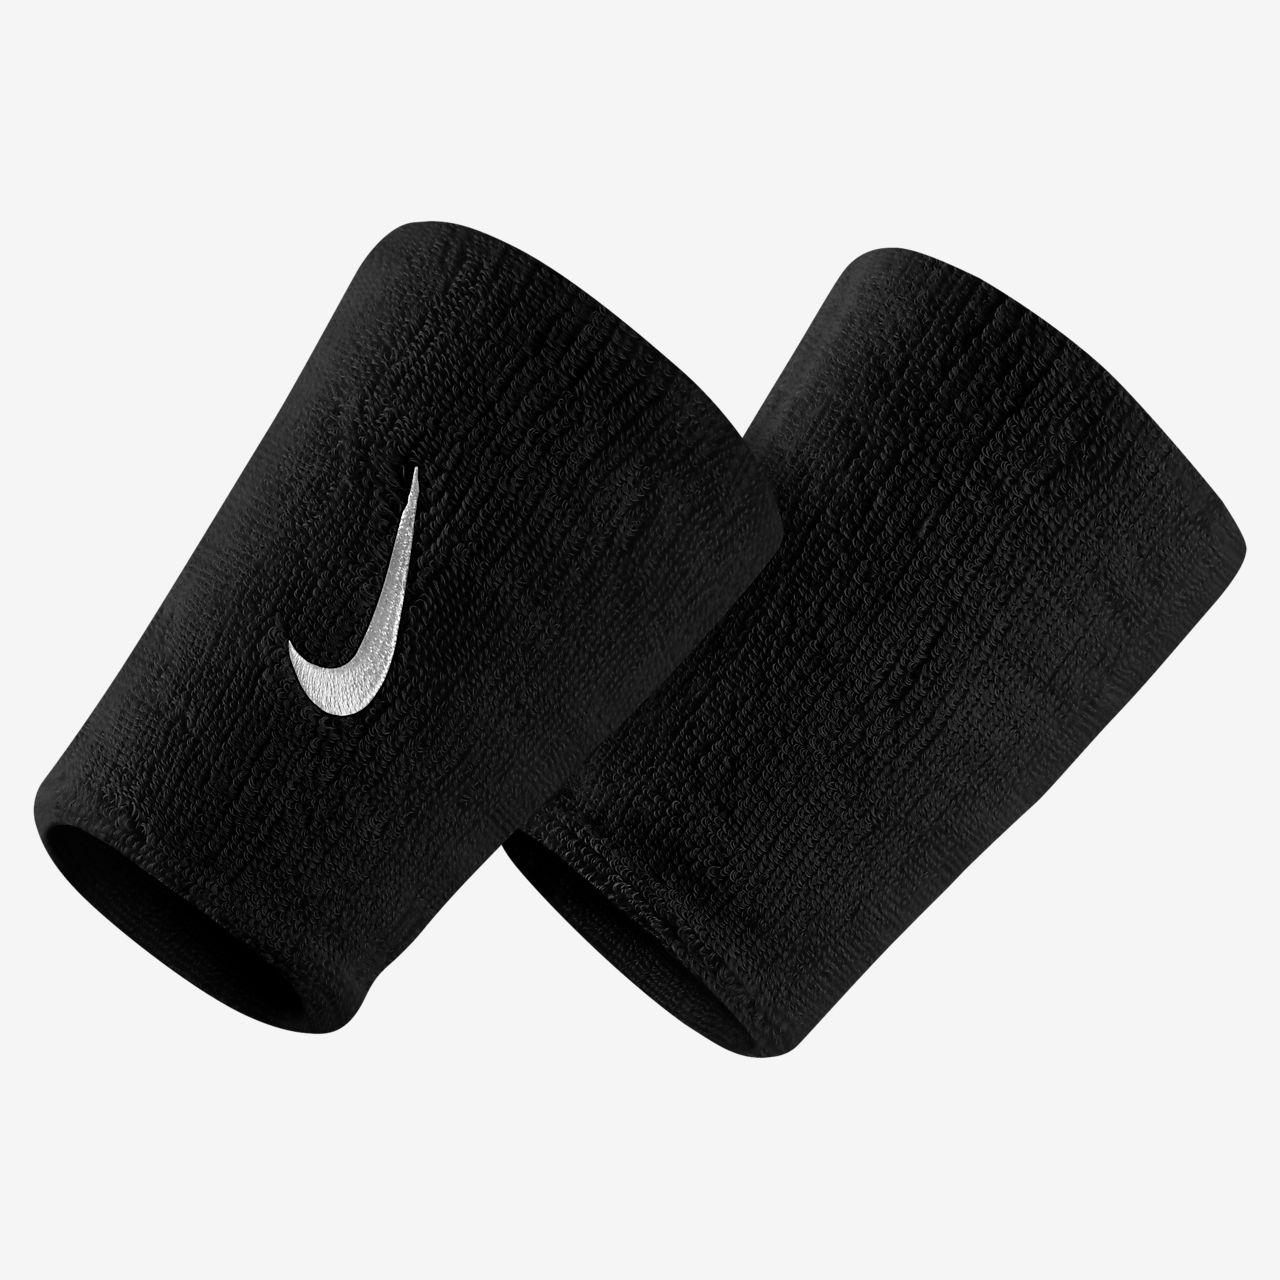 Munhequeira Nike Swoosh Longa - 1 Par  - Ferron Sport